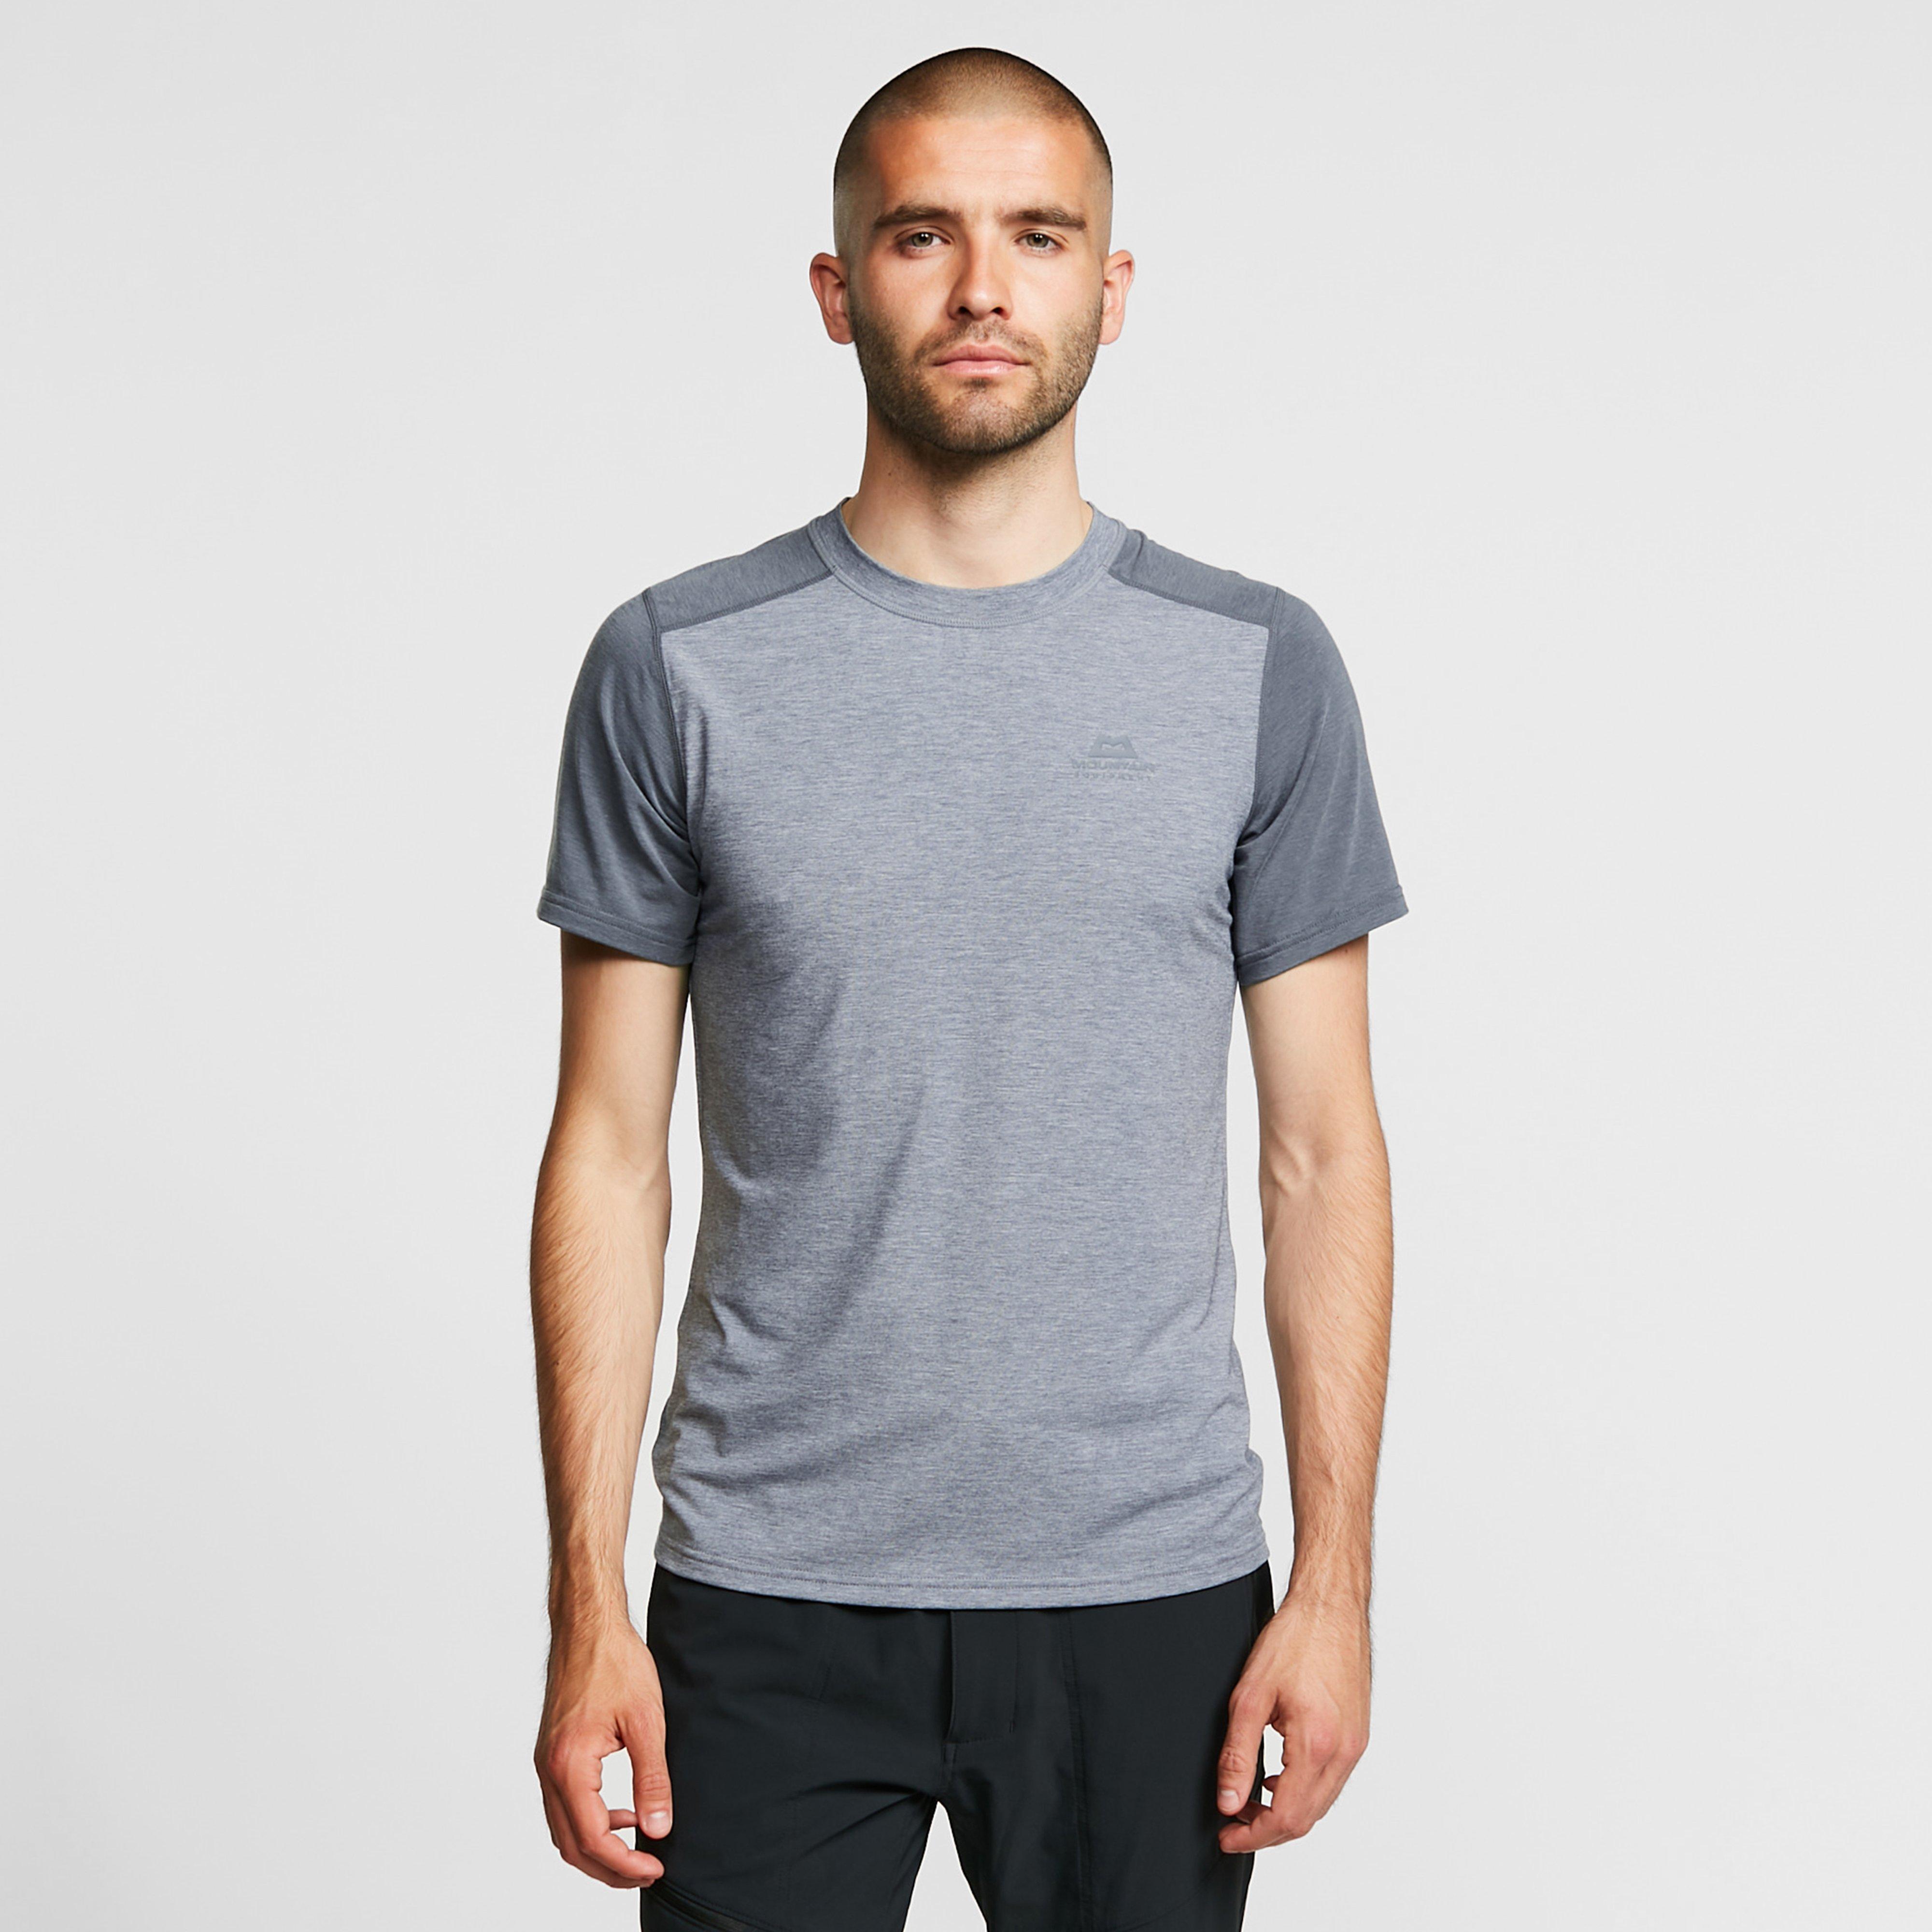 Image of Mountain Equipment Men's Headpoint Short-Sleeve Tee - Grey/Grey, GREY/GREY